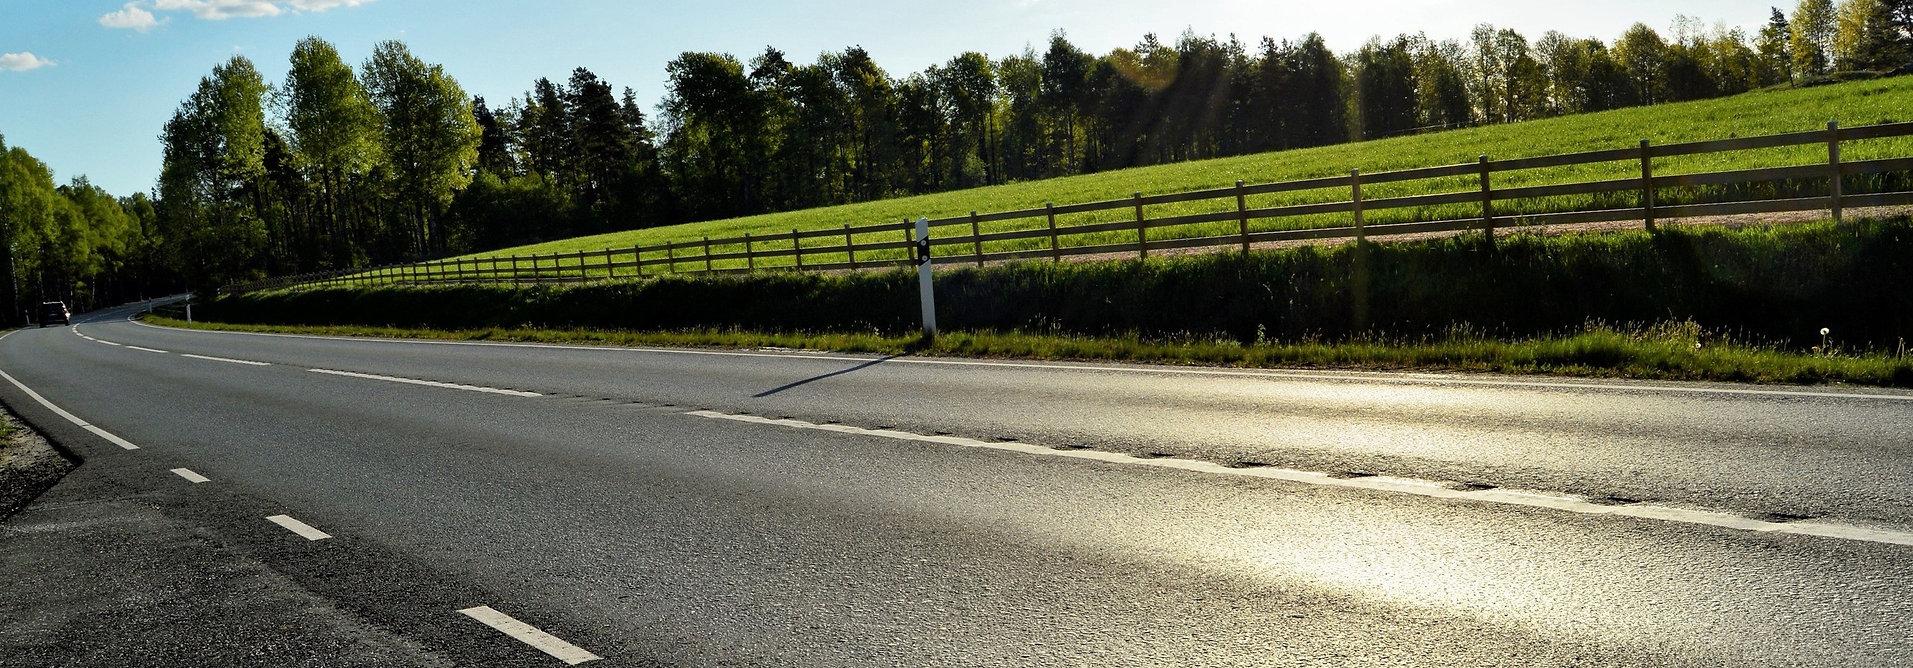 asphalt-clouds-curve-4618777.jpg